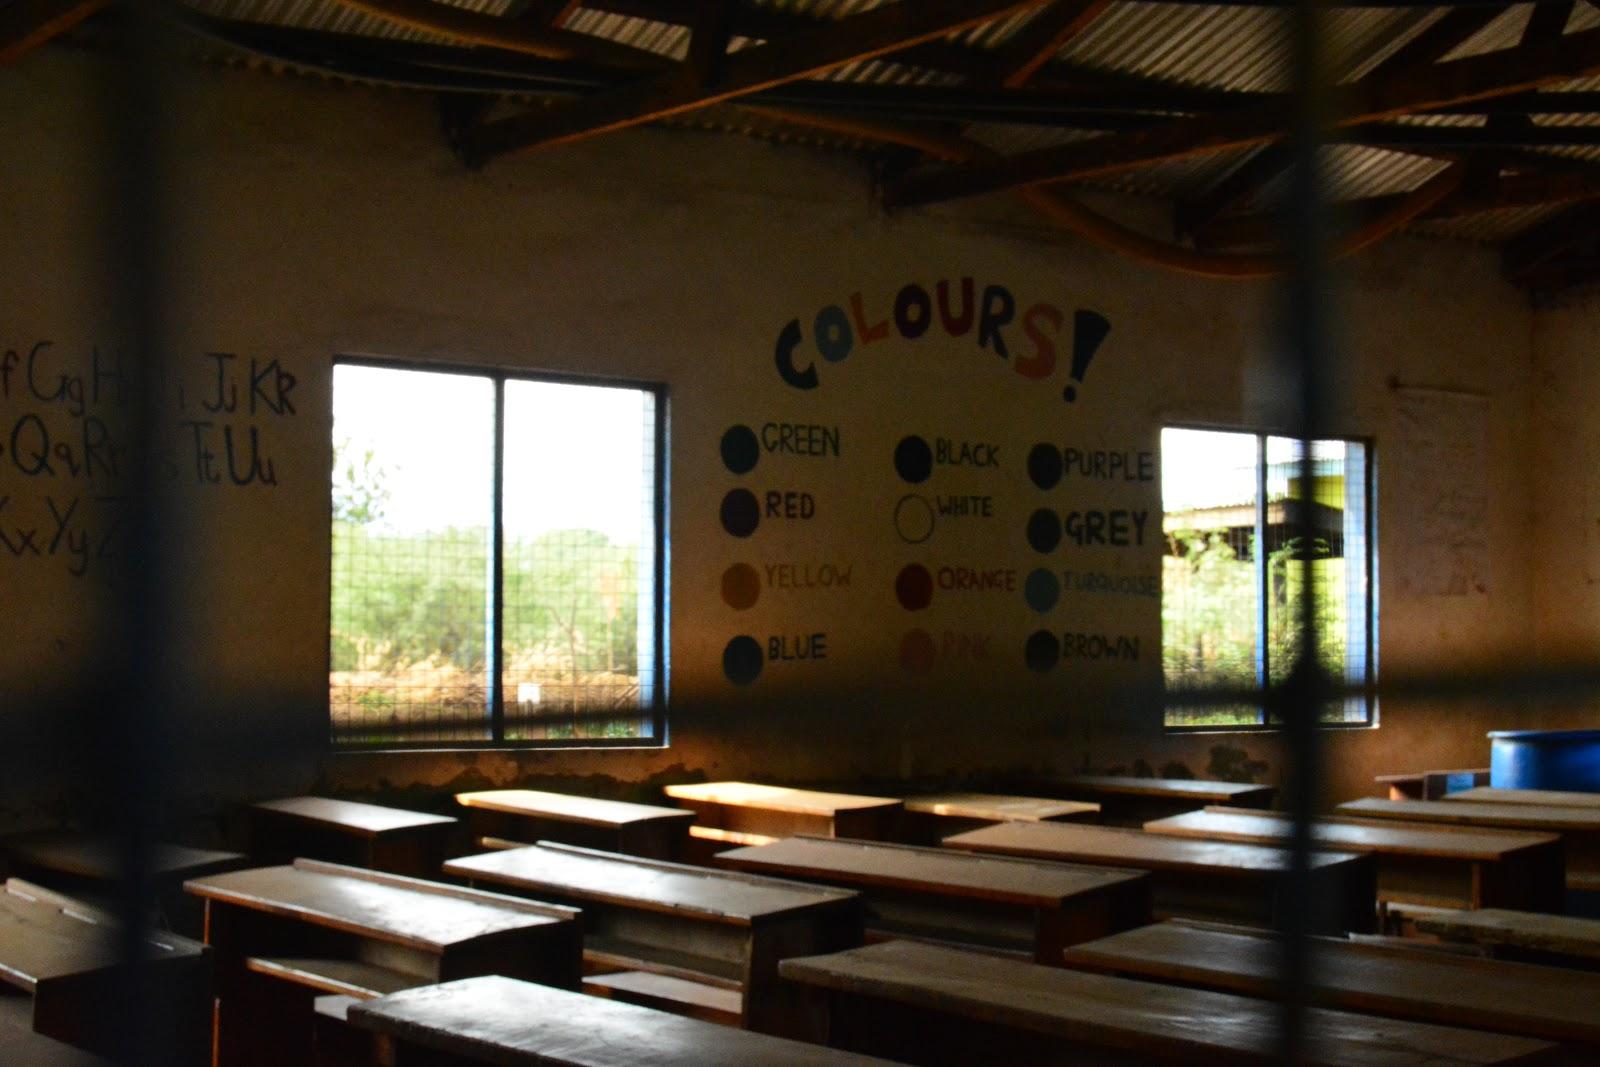 moshi, school, tanzania, kilimanjaro, childreach international, poverty